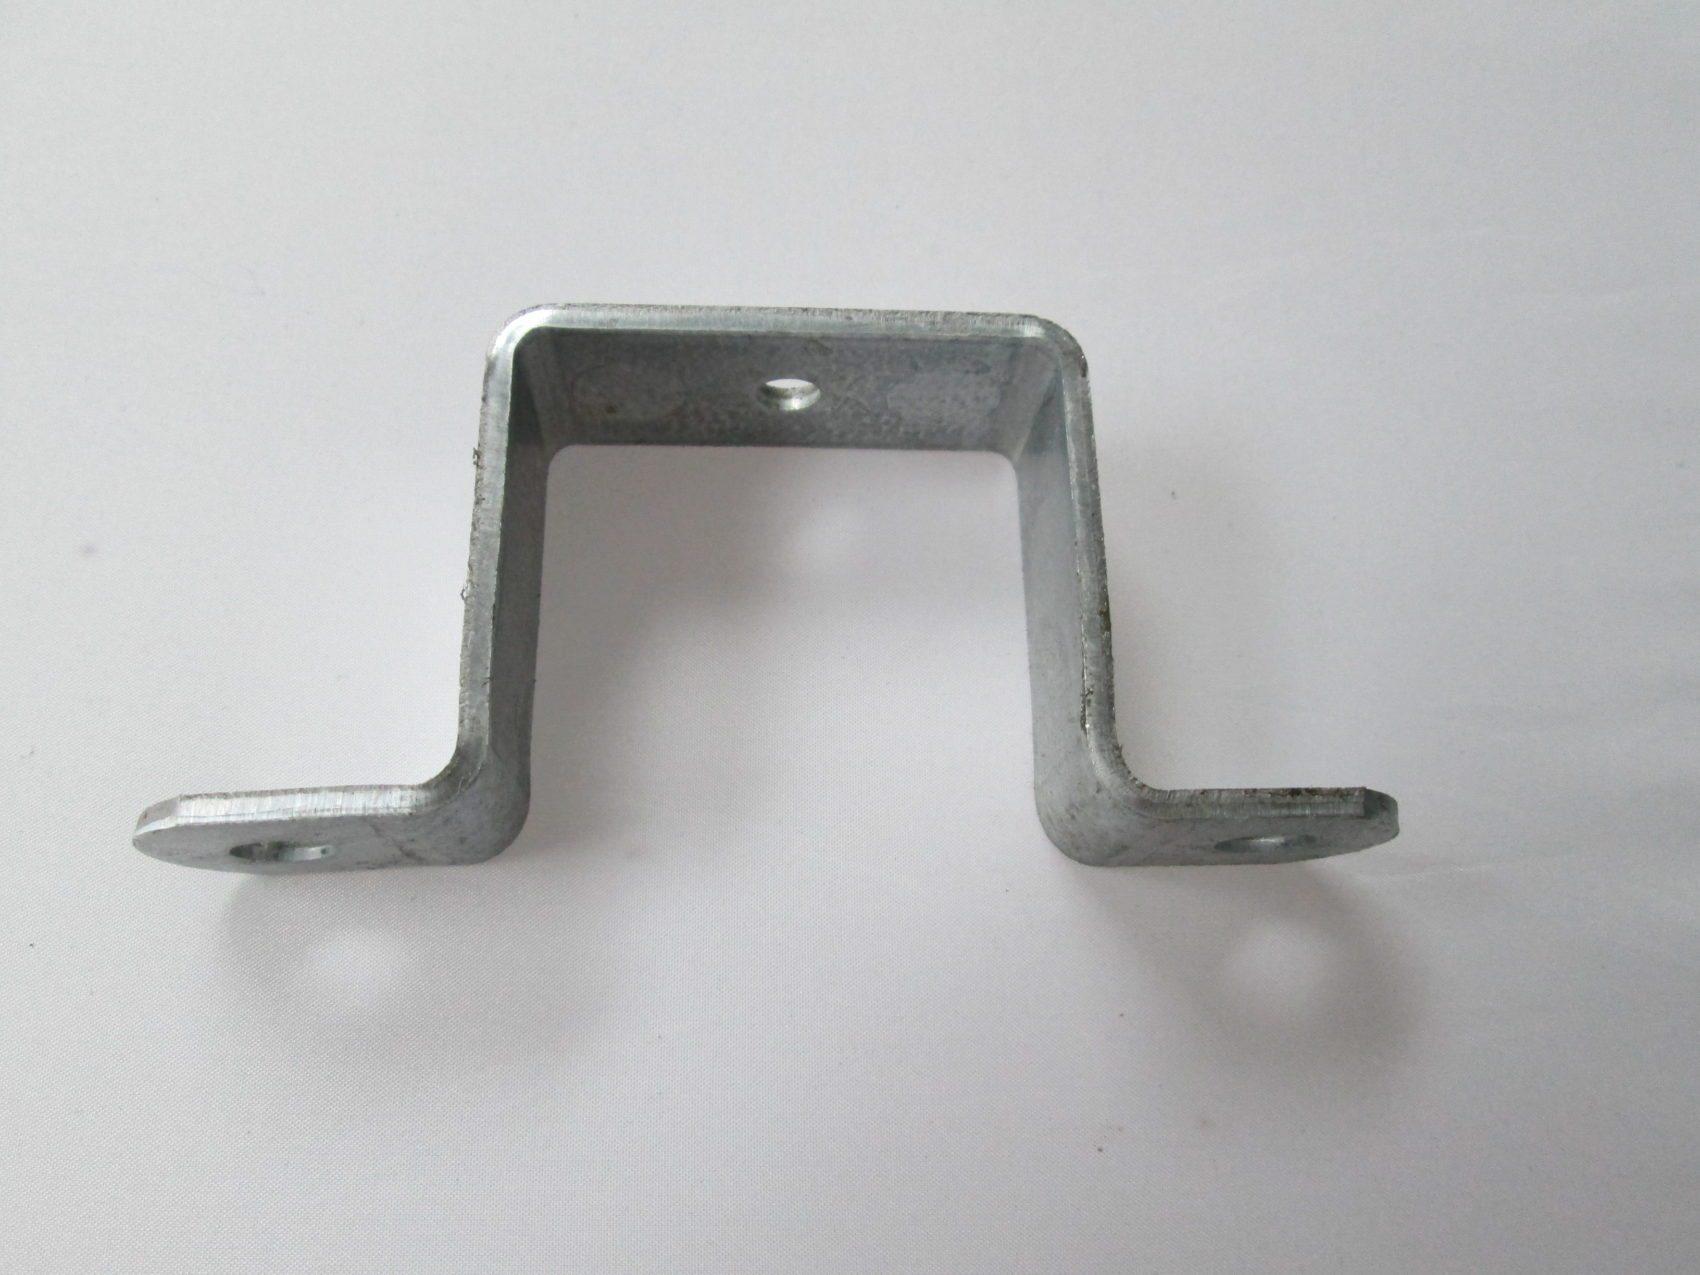 Purlin Clamp 2 x 2 | Atlas Manufacturing, Inc